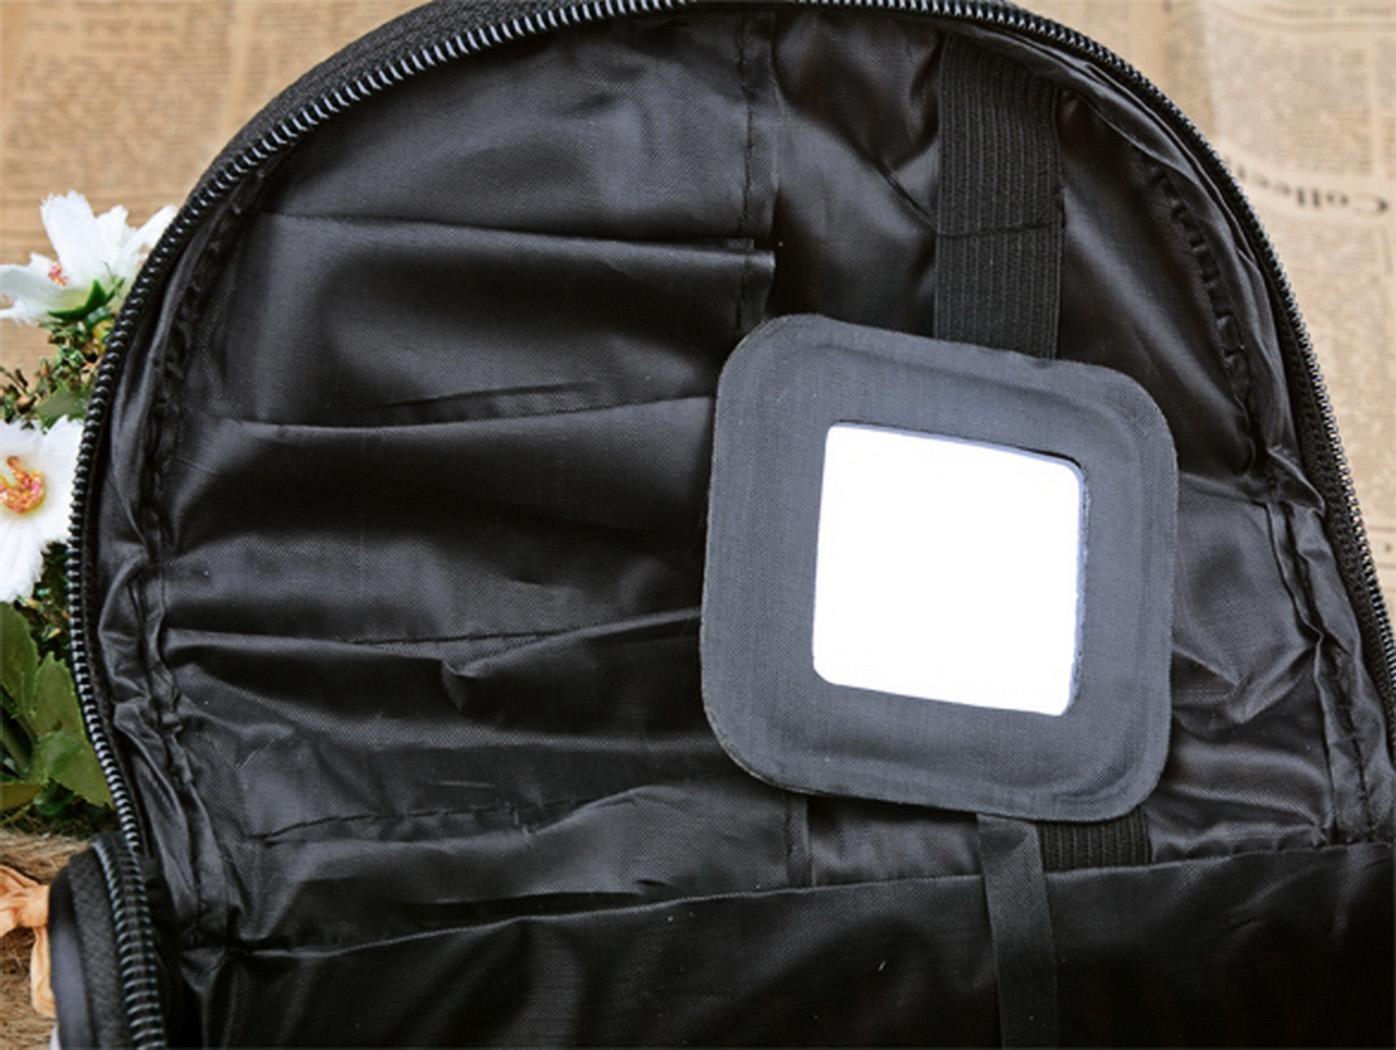 GuGio Cosmetic Bag Case, Zebras Patterns Print Travel Toiletry Bag Makeup Organizer